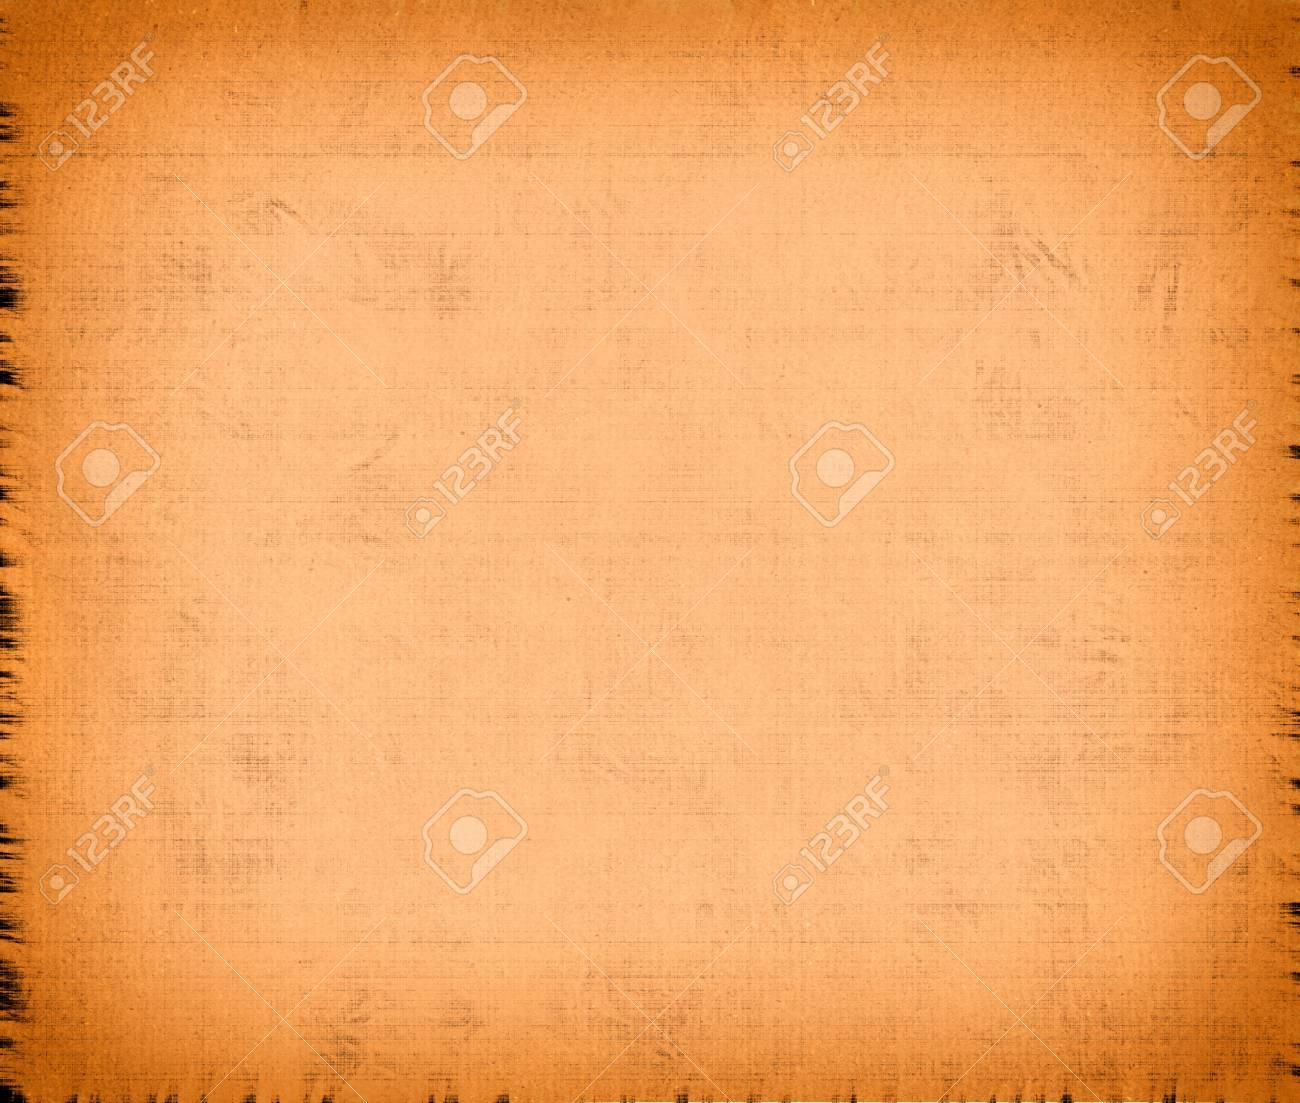 Old antique vintage paper background Stock Photo - 14355366